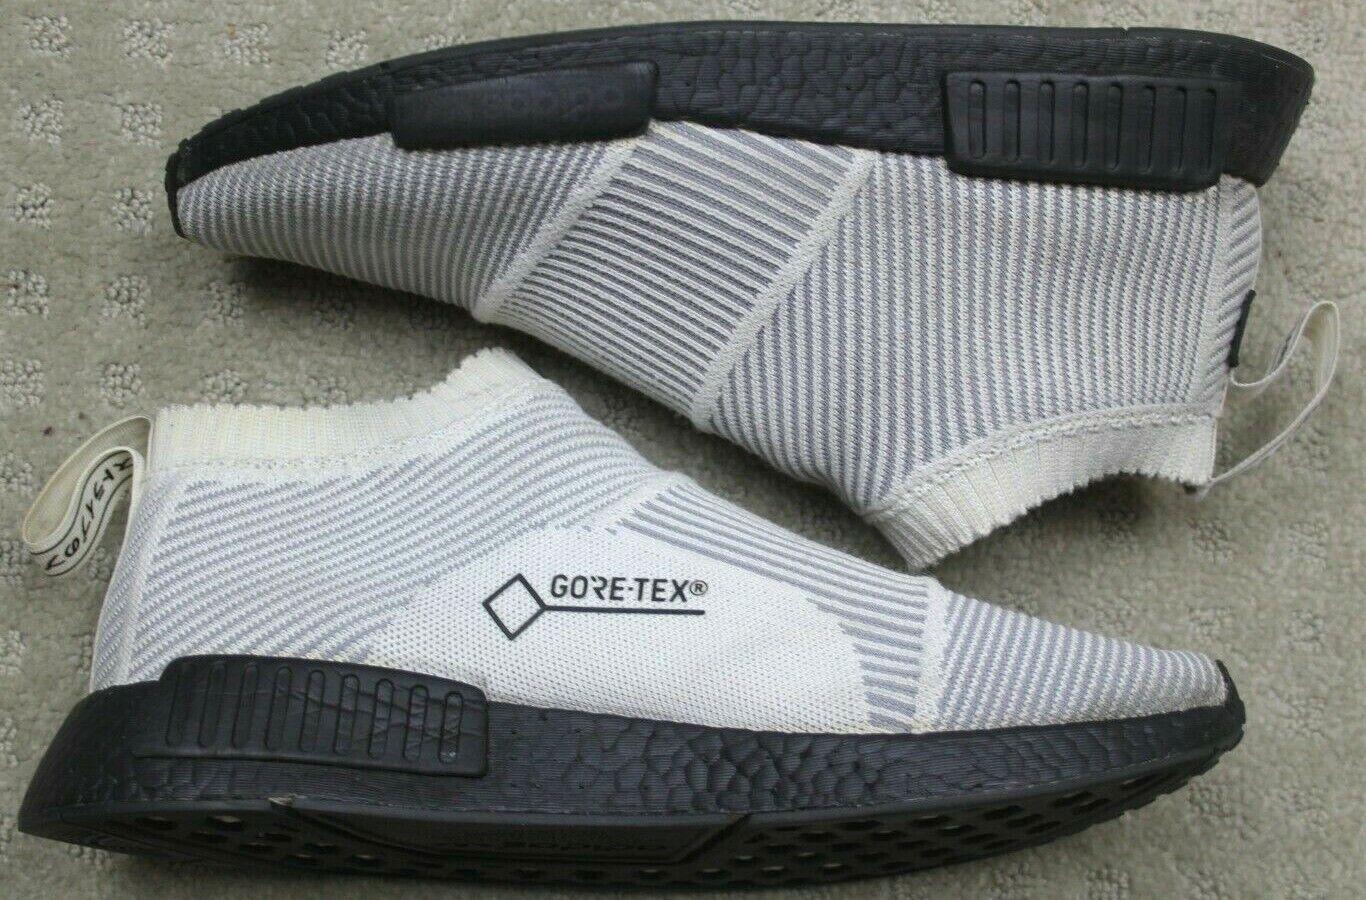 Men's Adidas NMD CS1 Gore-Tex PK White Black Size 10 Primeknit Ultra Boost